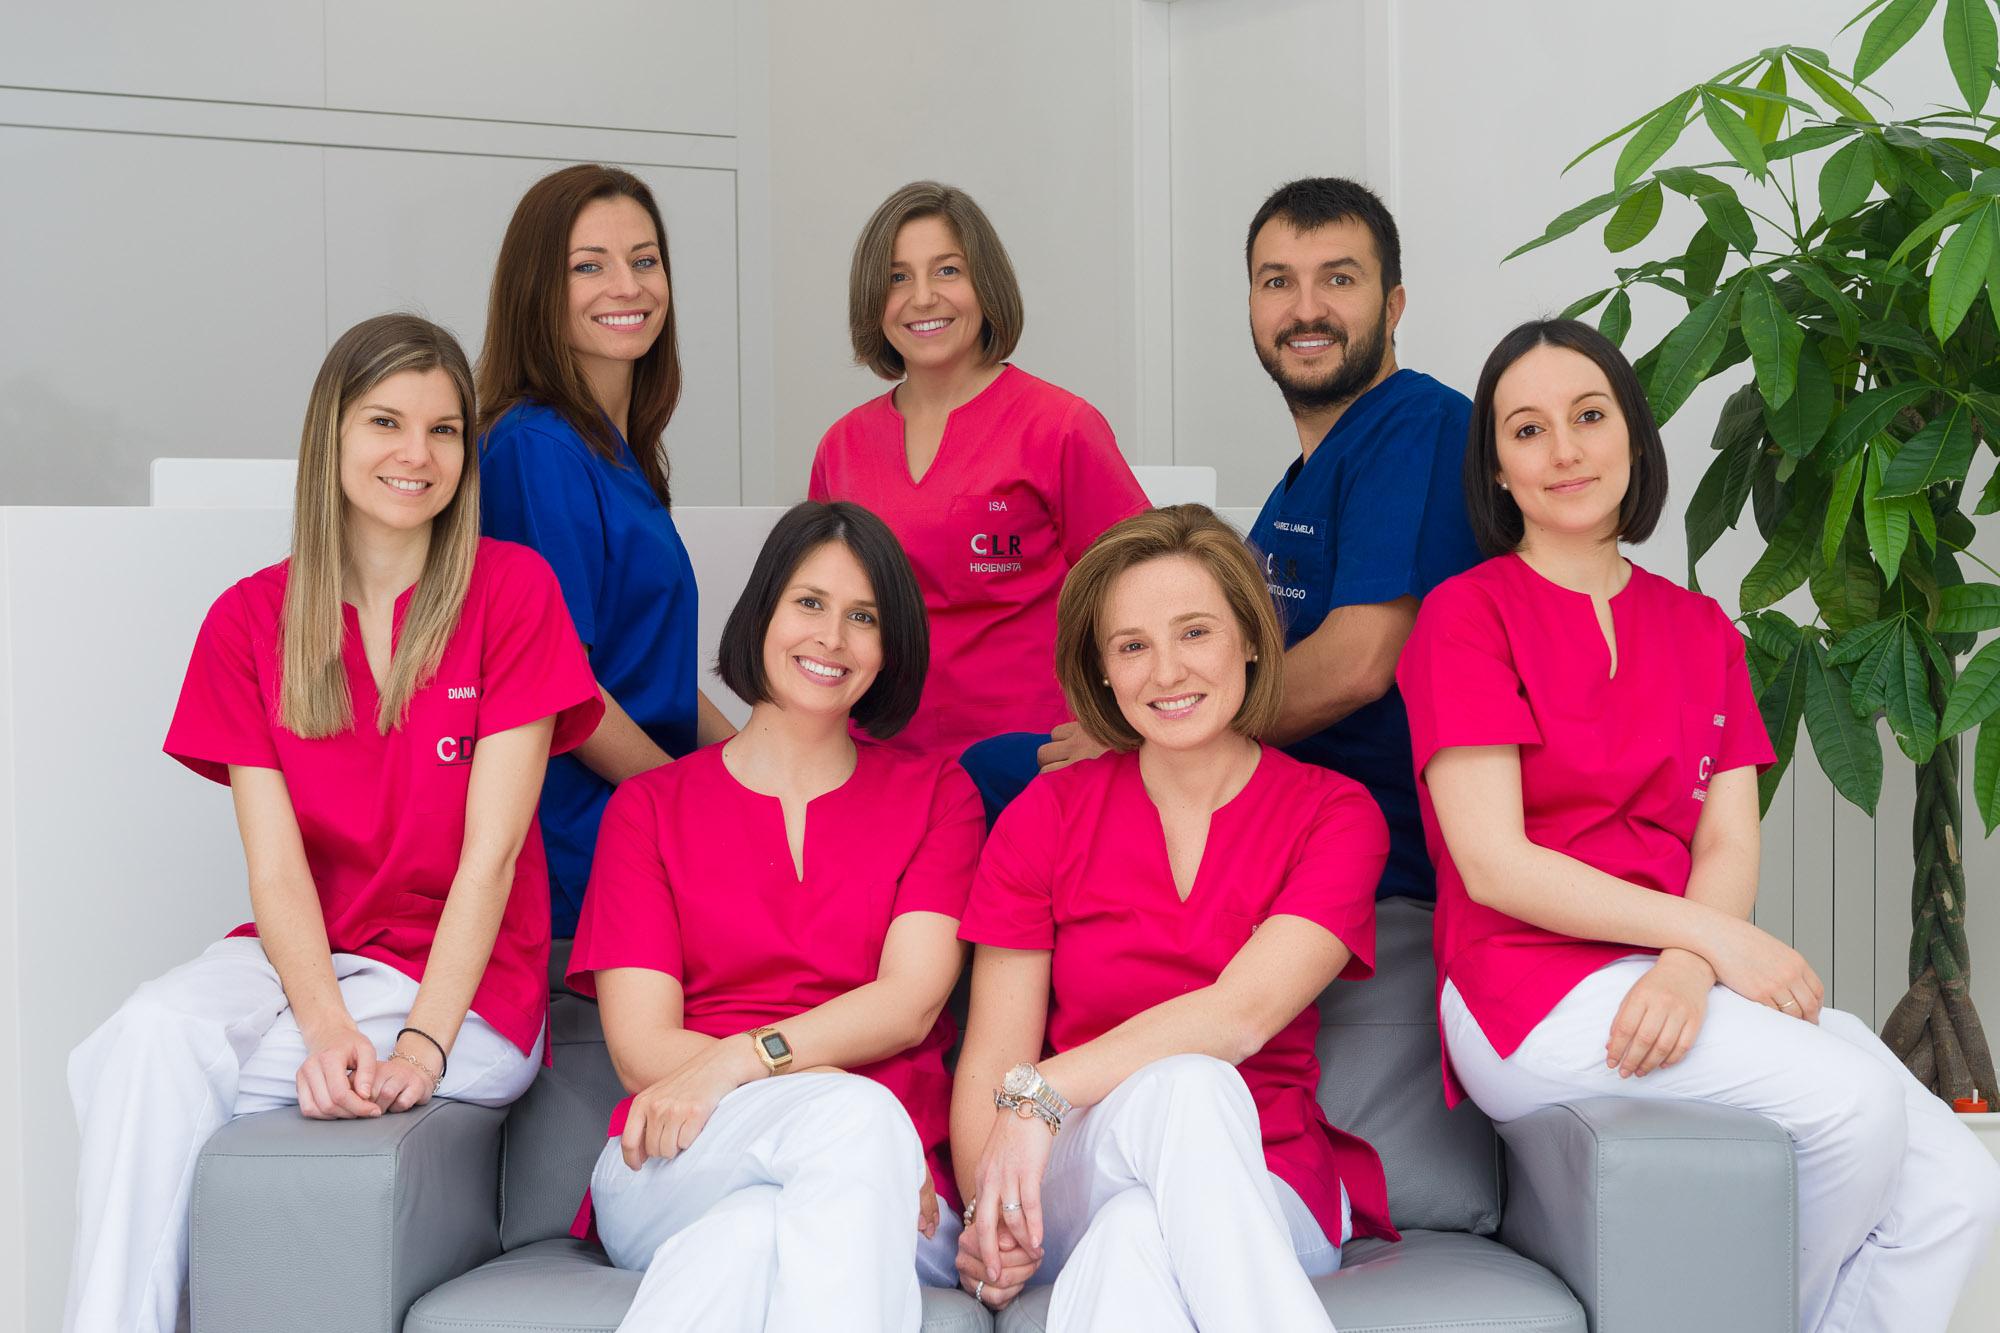 Fotografía corporativa-Equipo de traballo-clínica dental Lamela-Bertamiráns